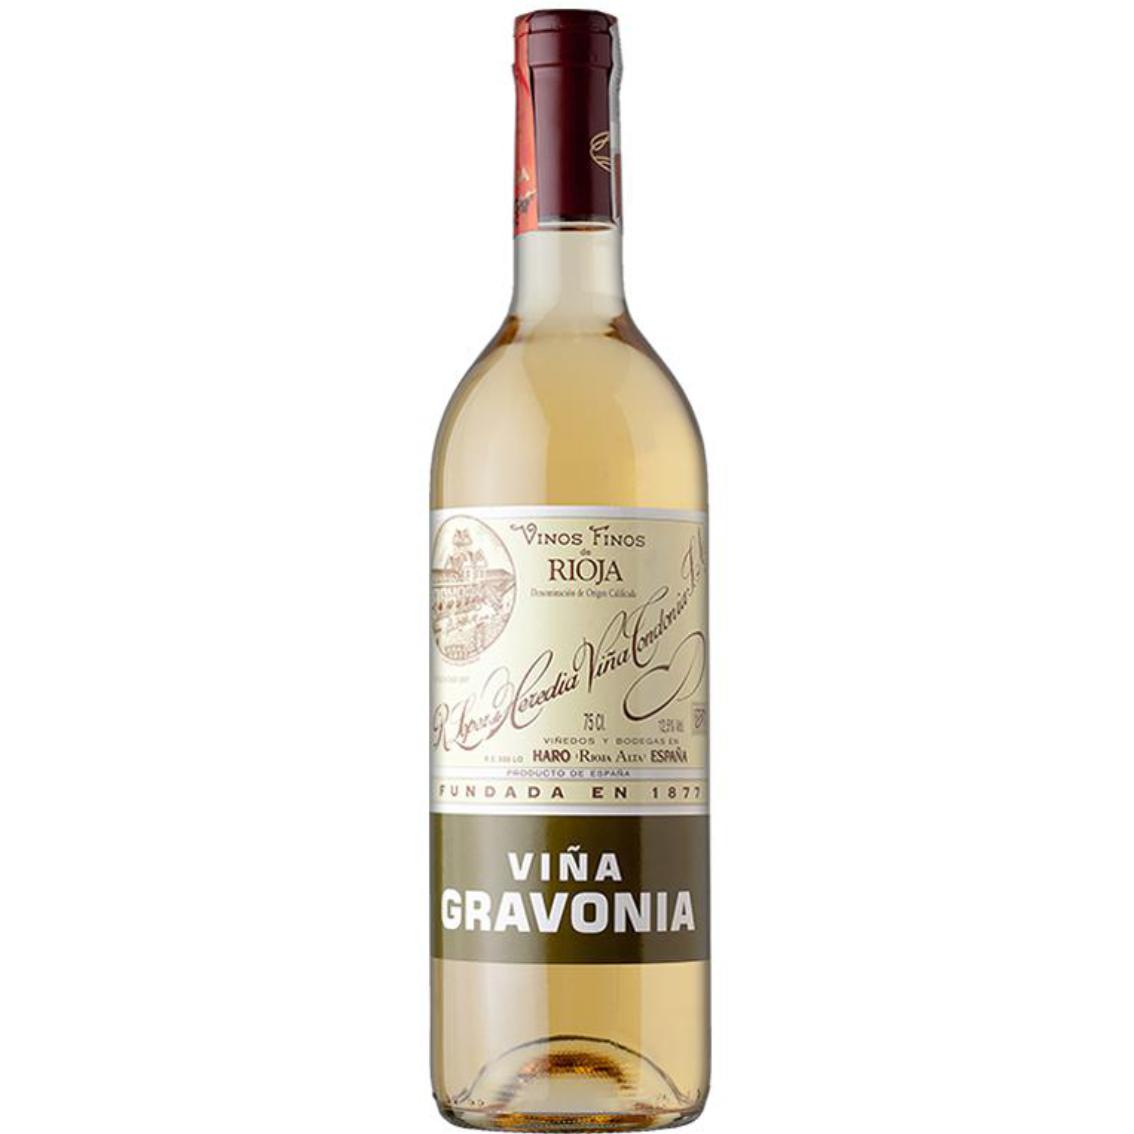 2010 Vina Gravonia Blanco Crianza Rioja - Lopez de Heredia